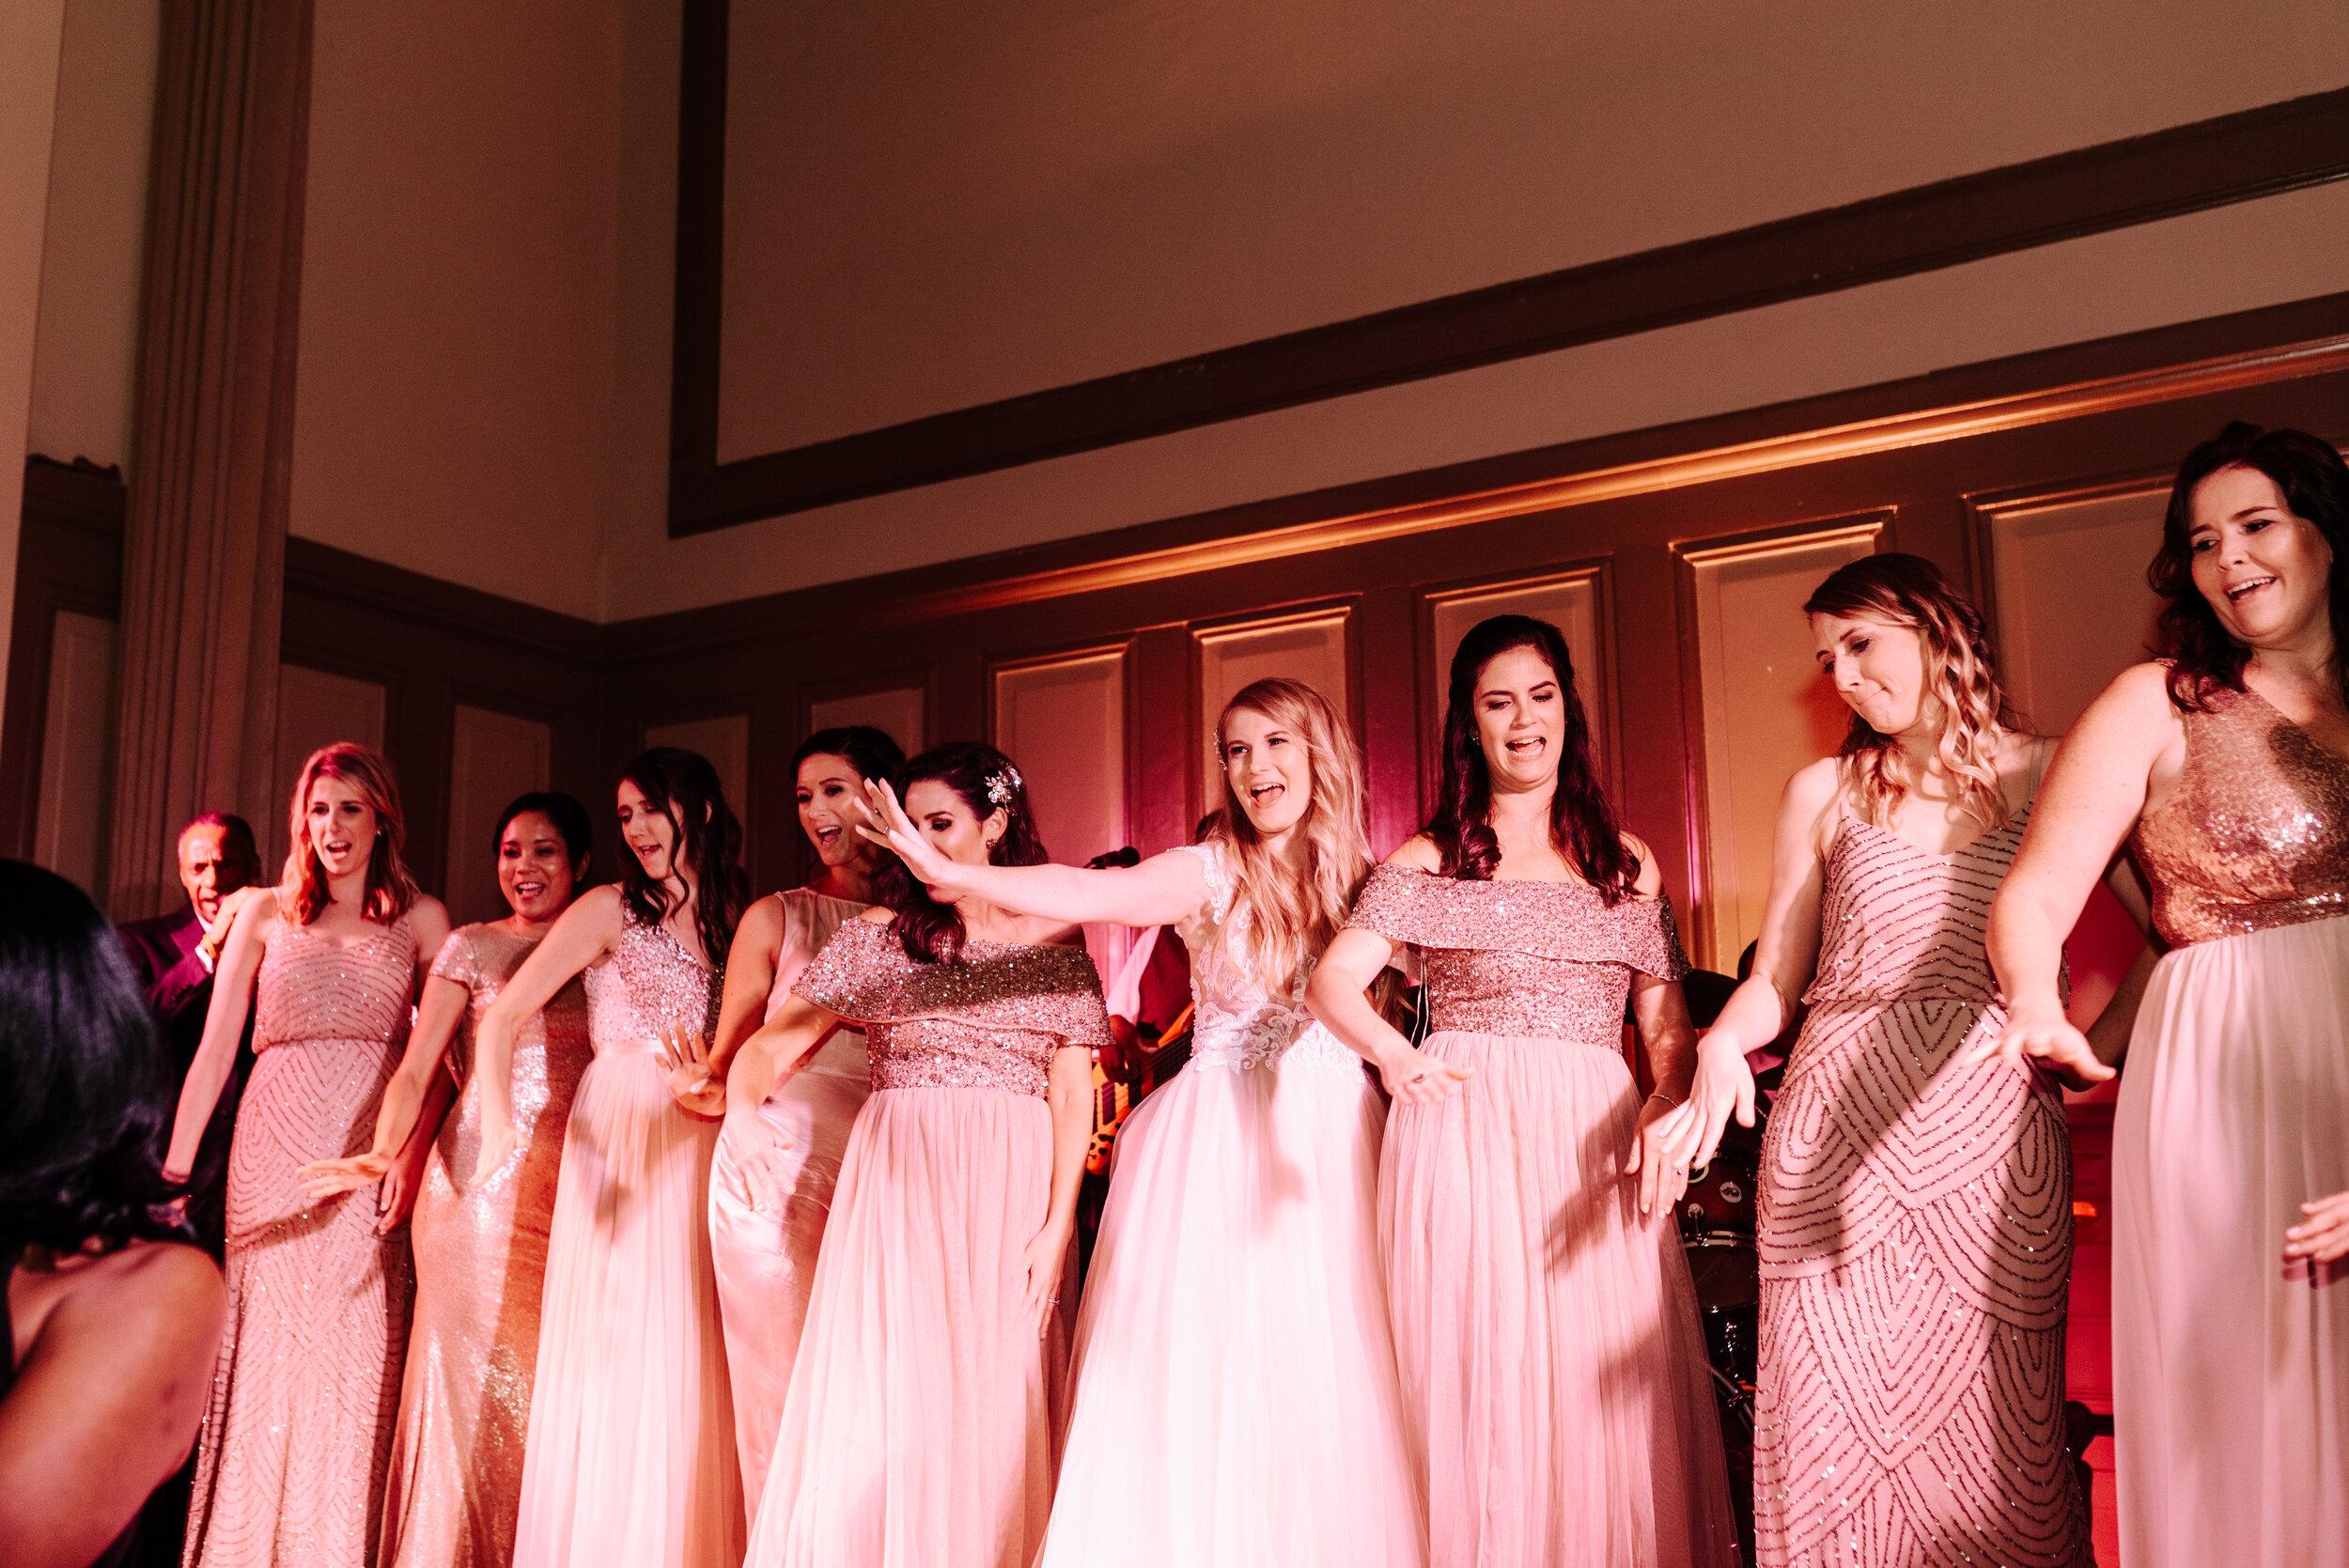 Cassie-Mrunal-Wedding-Quirk-Hotel-John-Marshall-Ballrooms-Richmond-Virginia-Photography-by-V-103.jpg